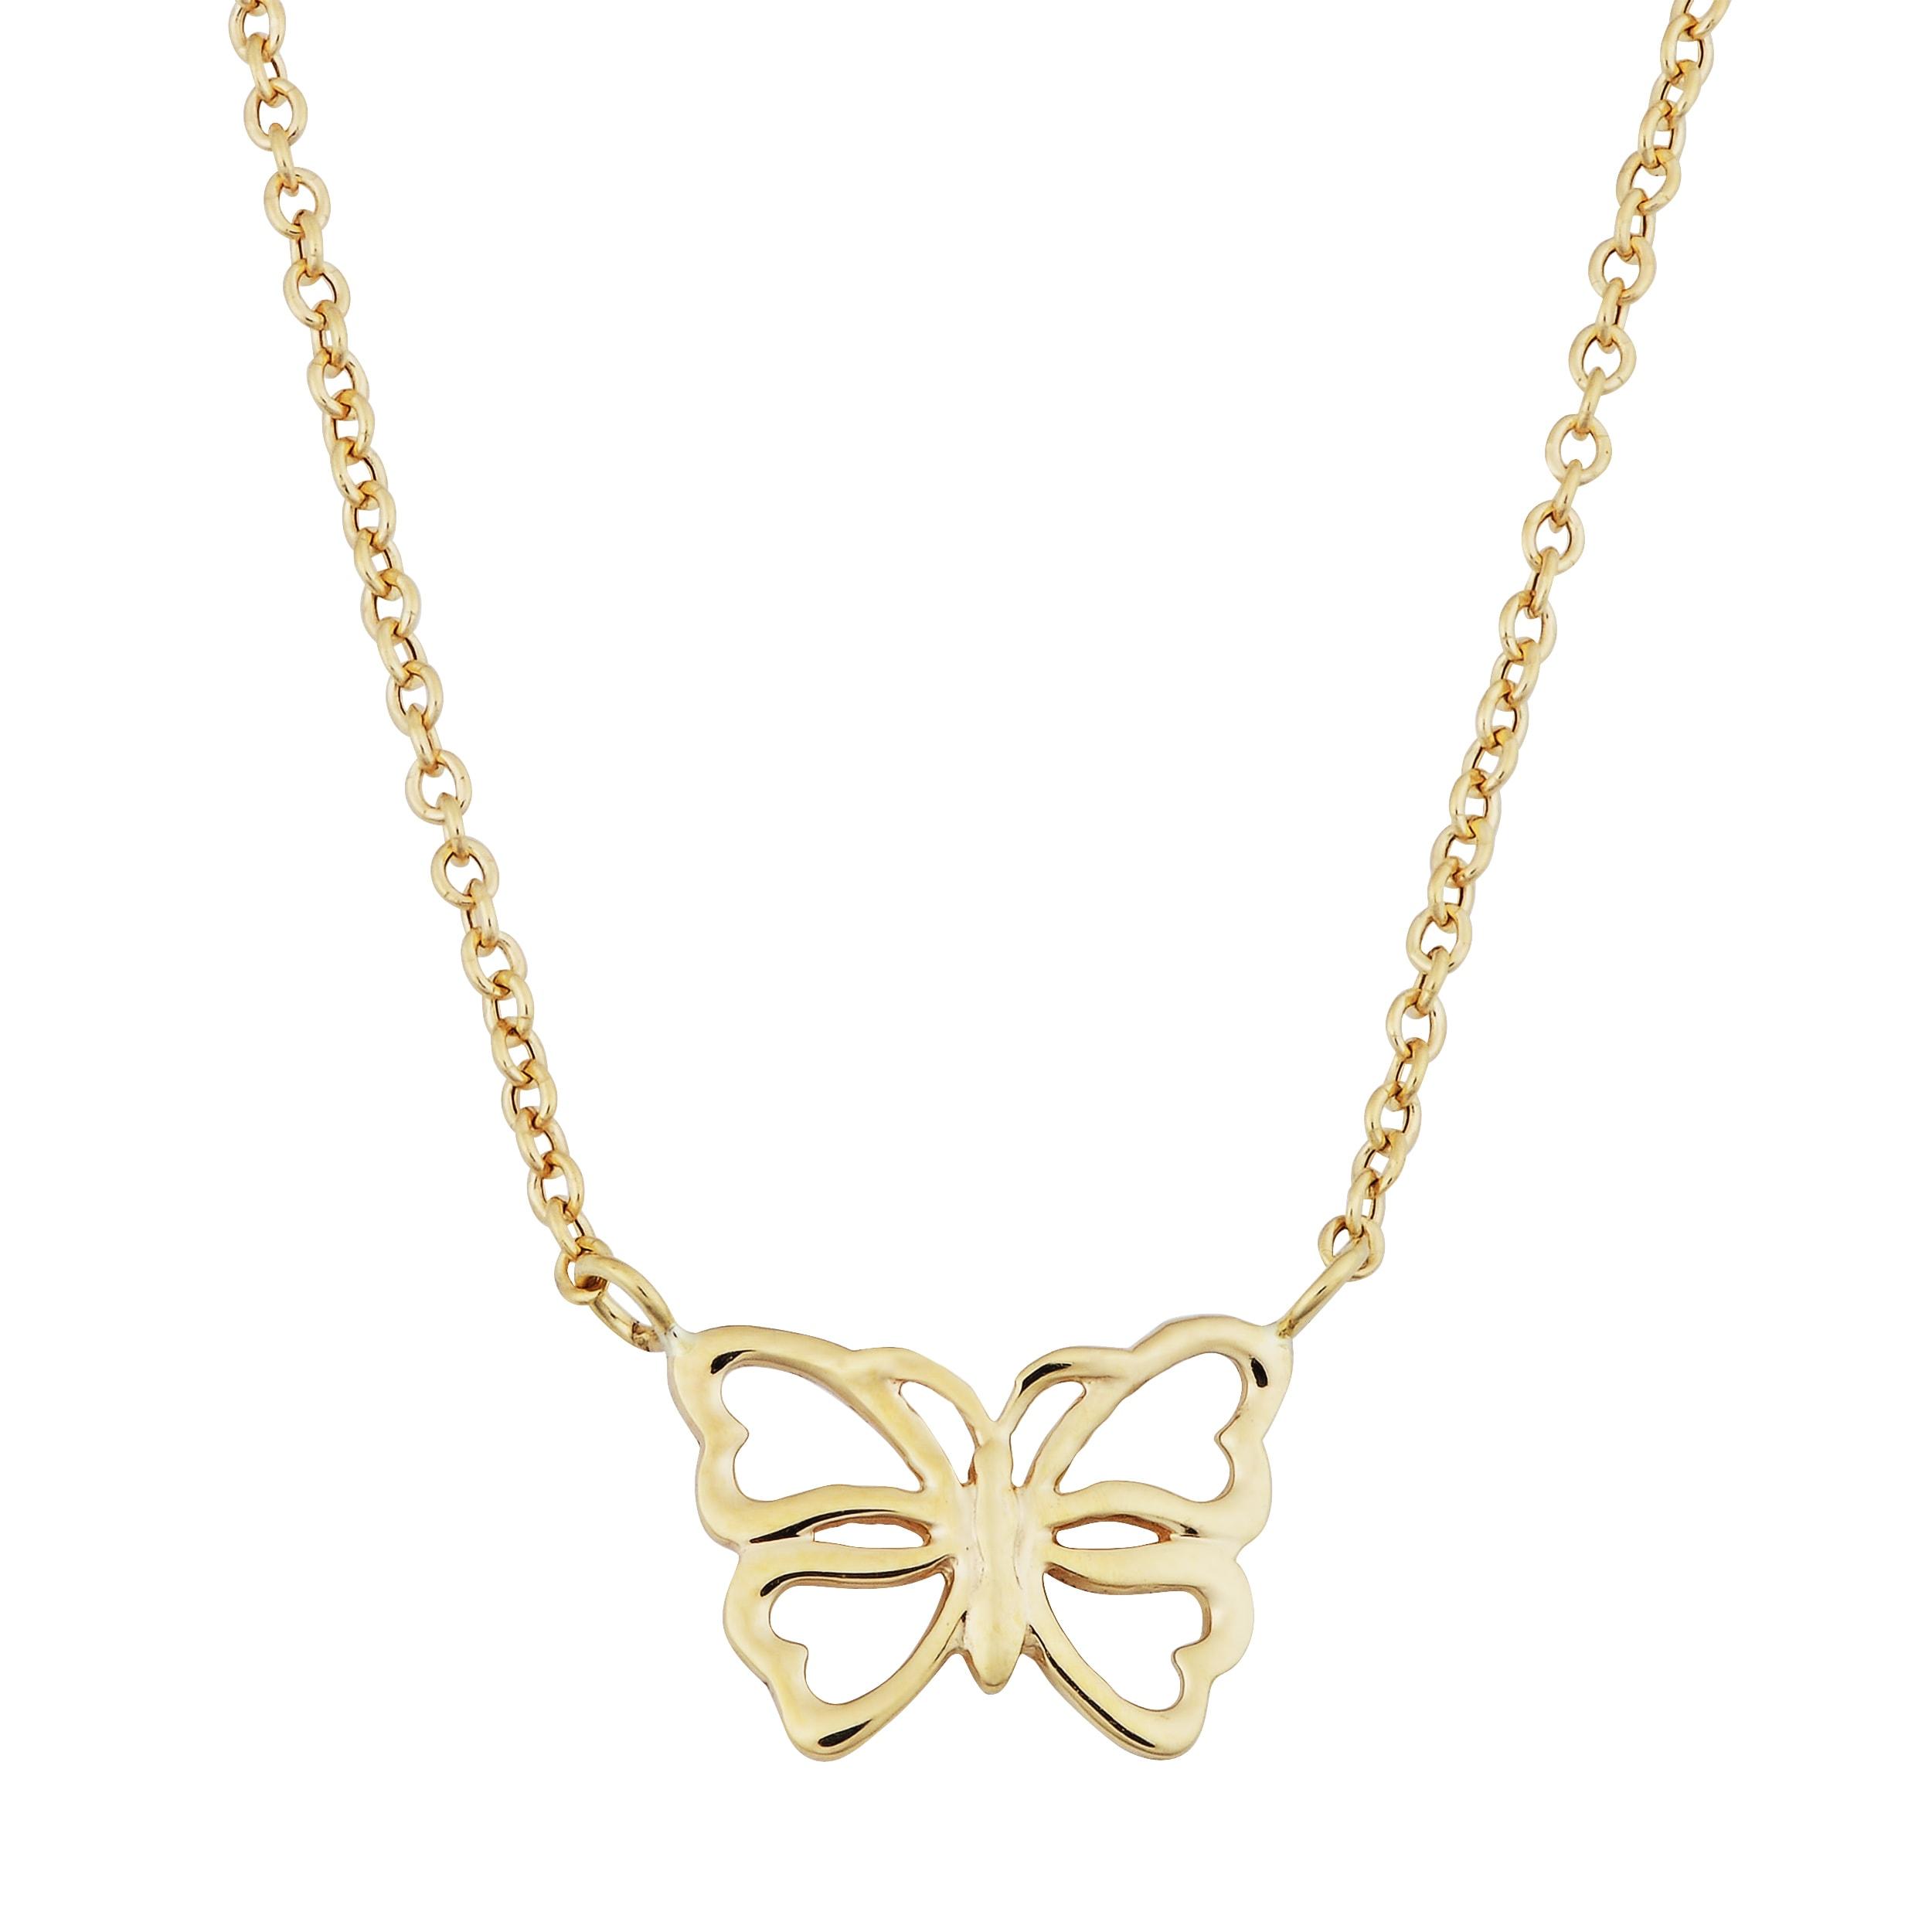 Fremada 14k Gold Butterfly Adjustable Length Necklace (Ye...